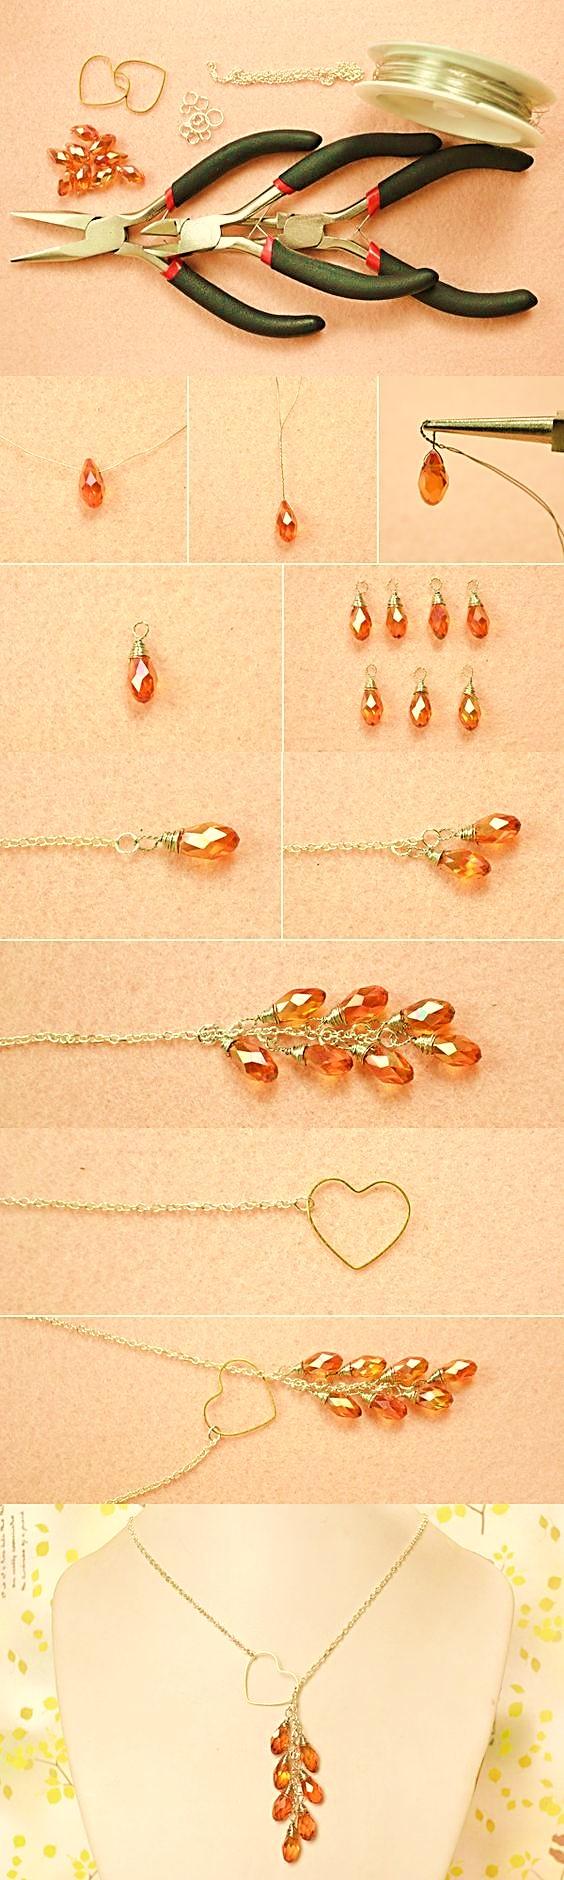 4e123fe6f7ae collar cristales ambar bisuteria paso a paso gratis joyeria joyas tutorial